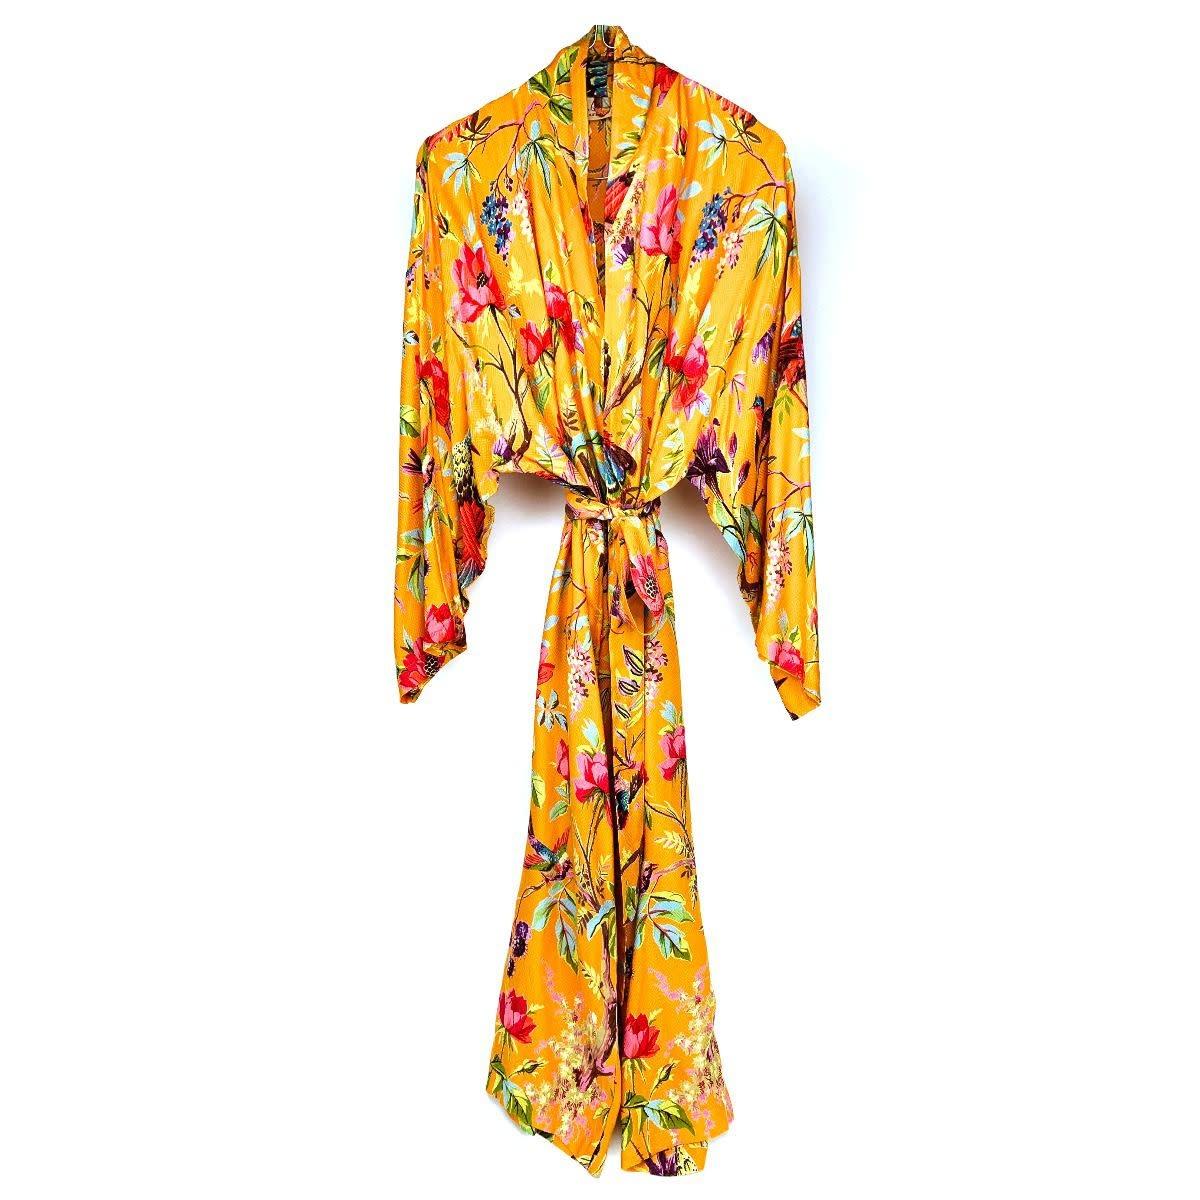 Imbarro Home & Fashion Imbarro Kimono Paradise Orange Onesize